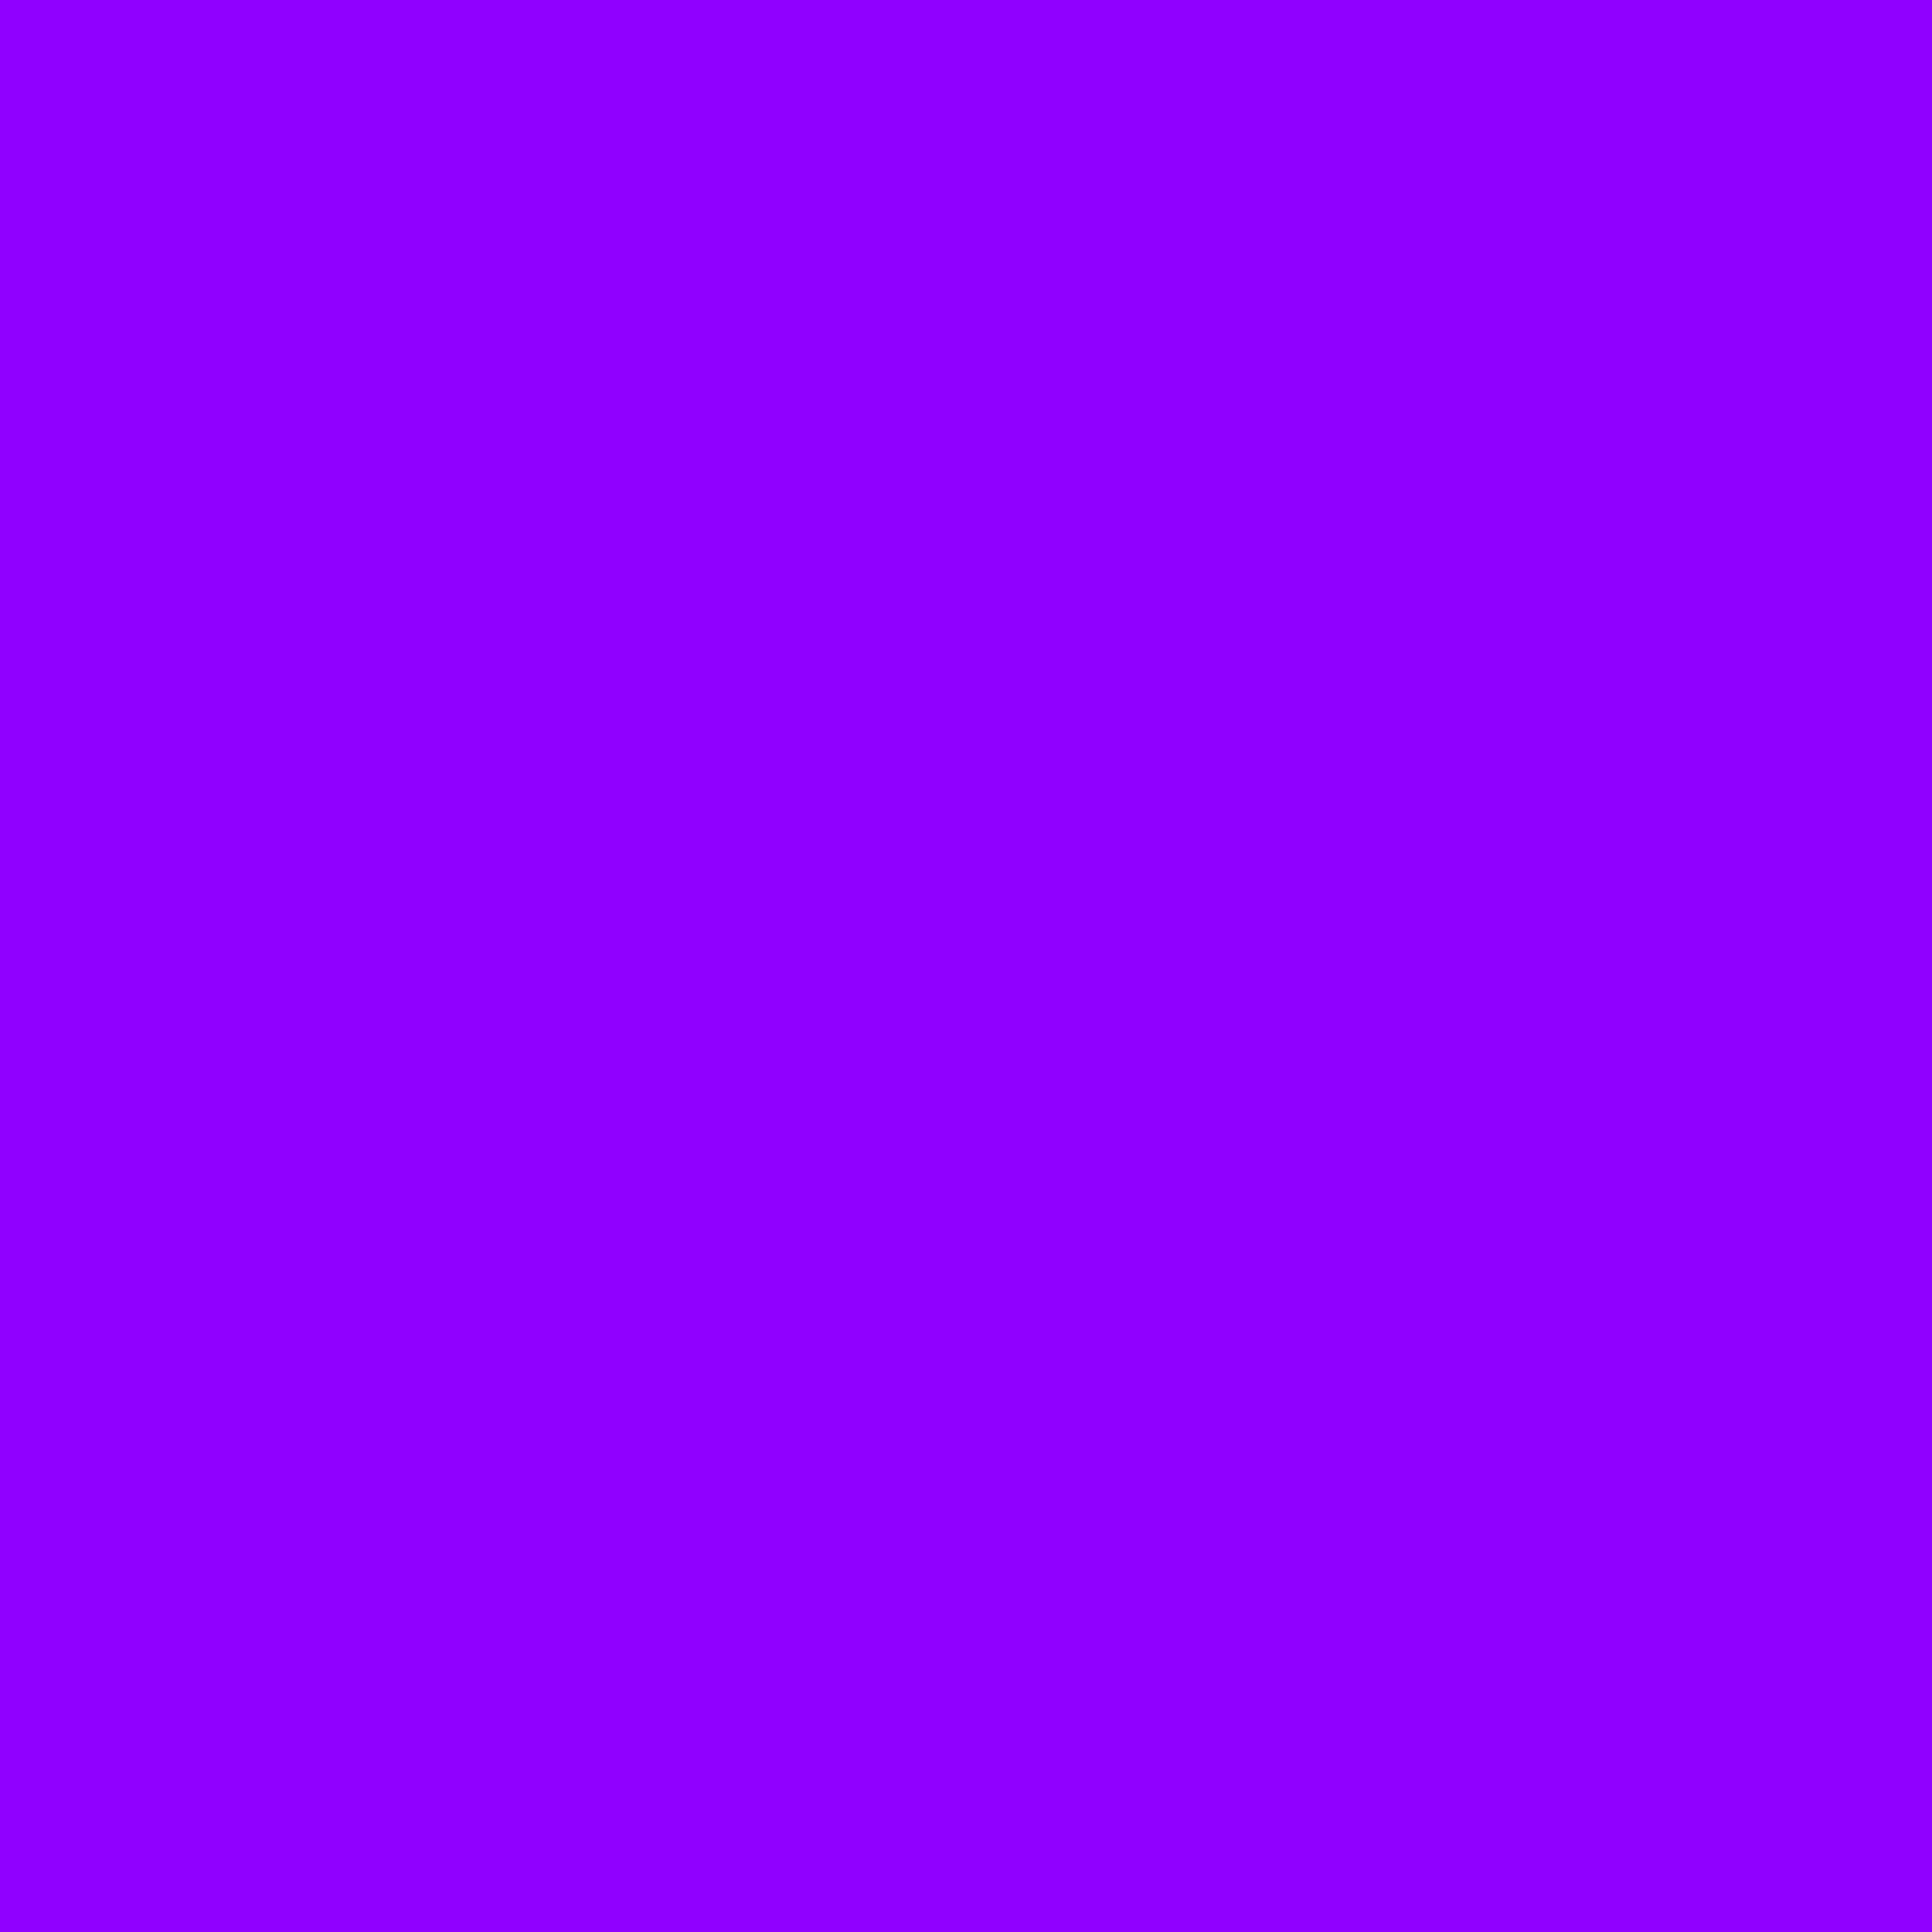 2048x2048 Electric Violet Solid Color Background